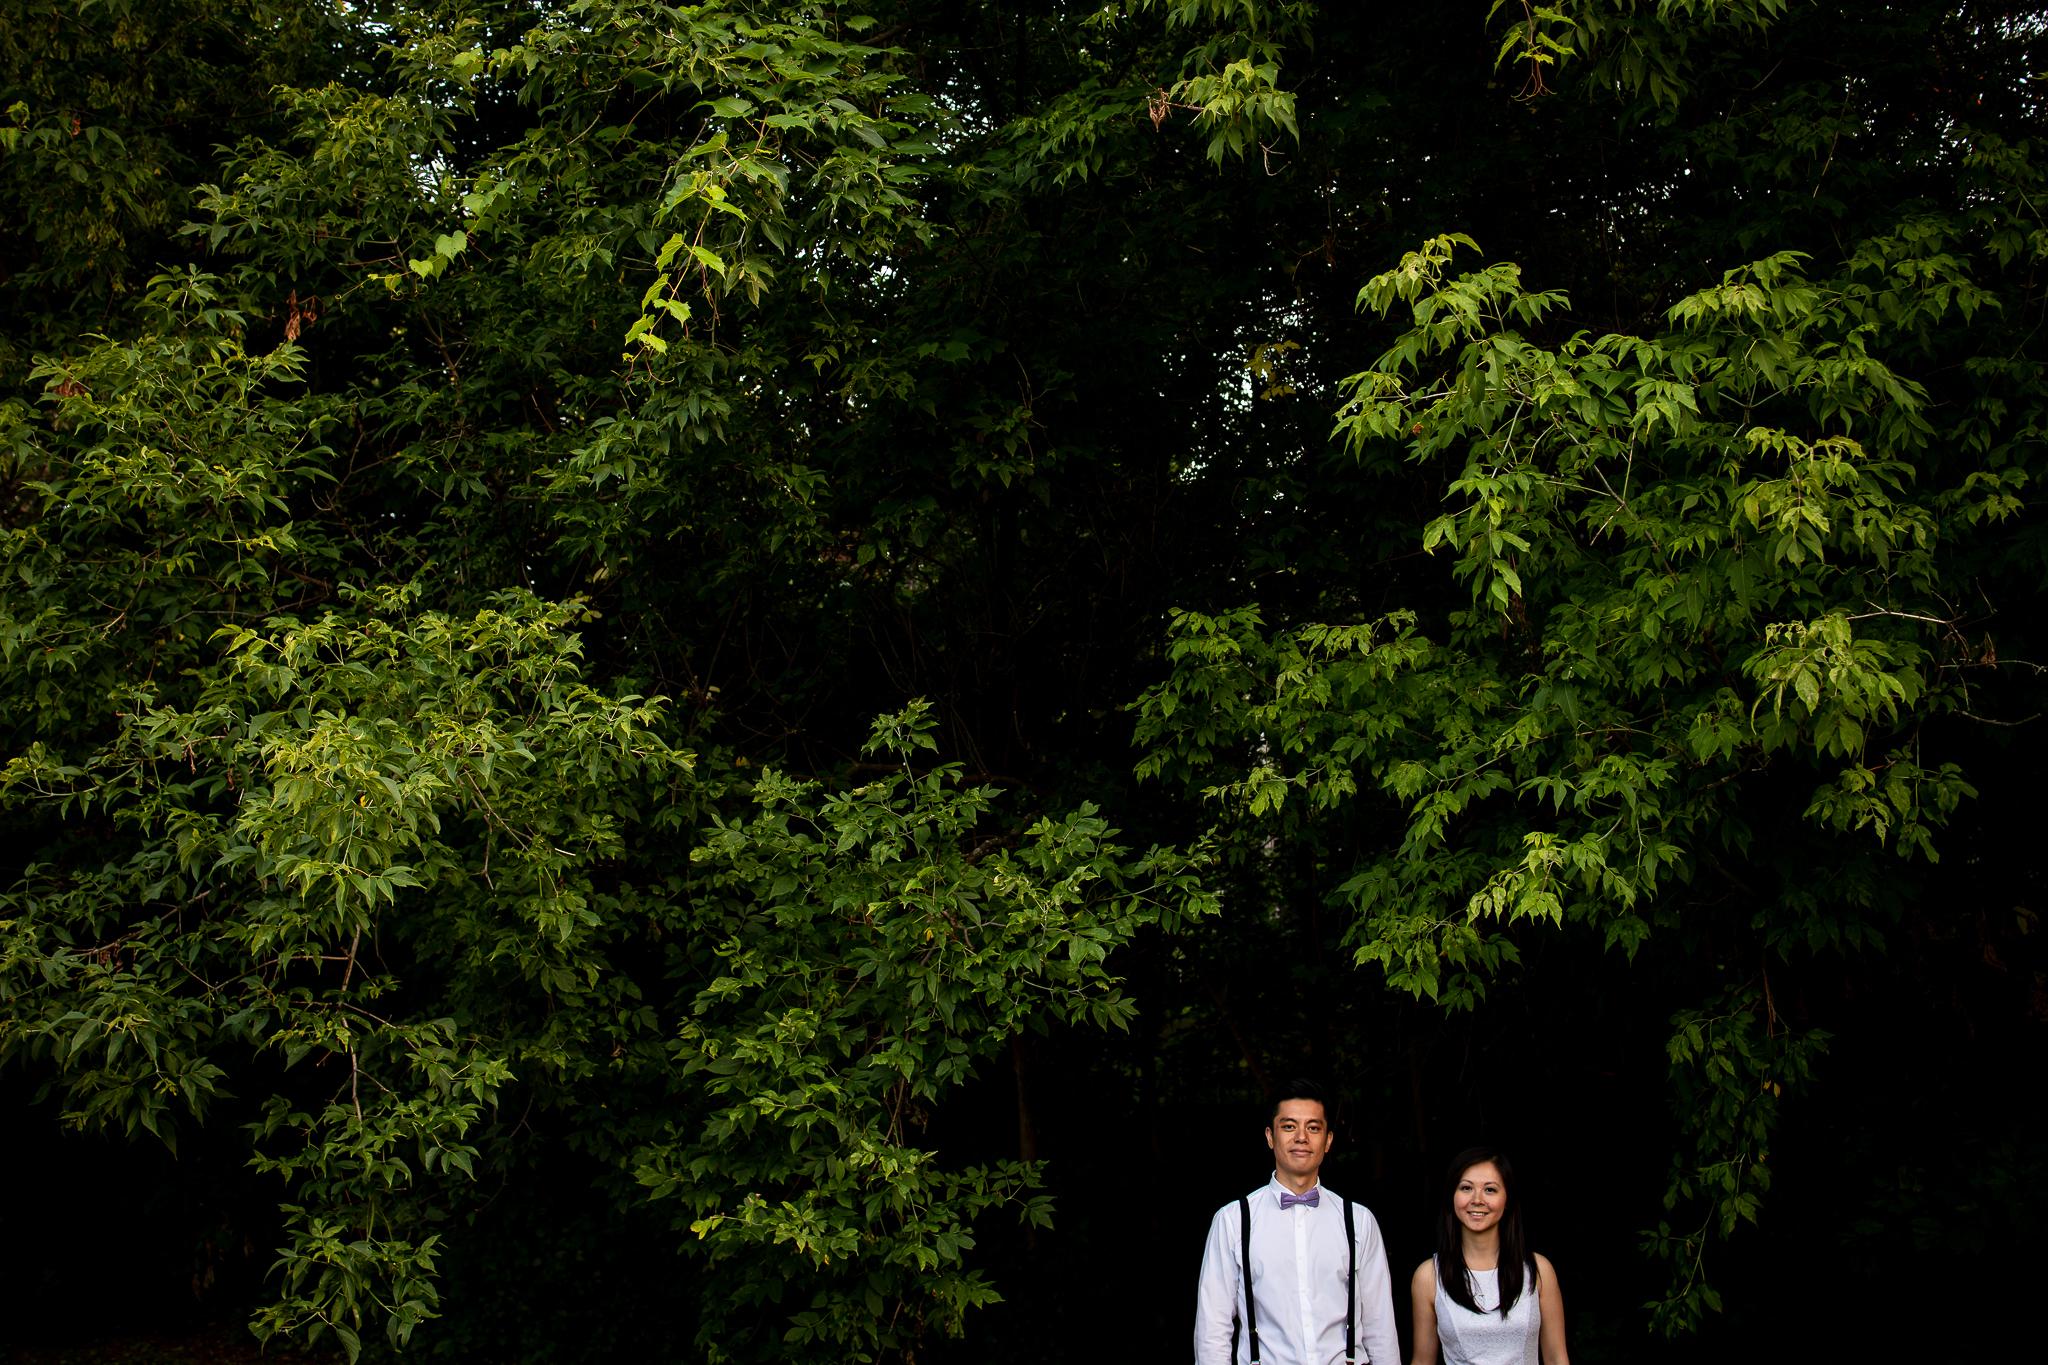 unionville-engagement-photos-13.jpg